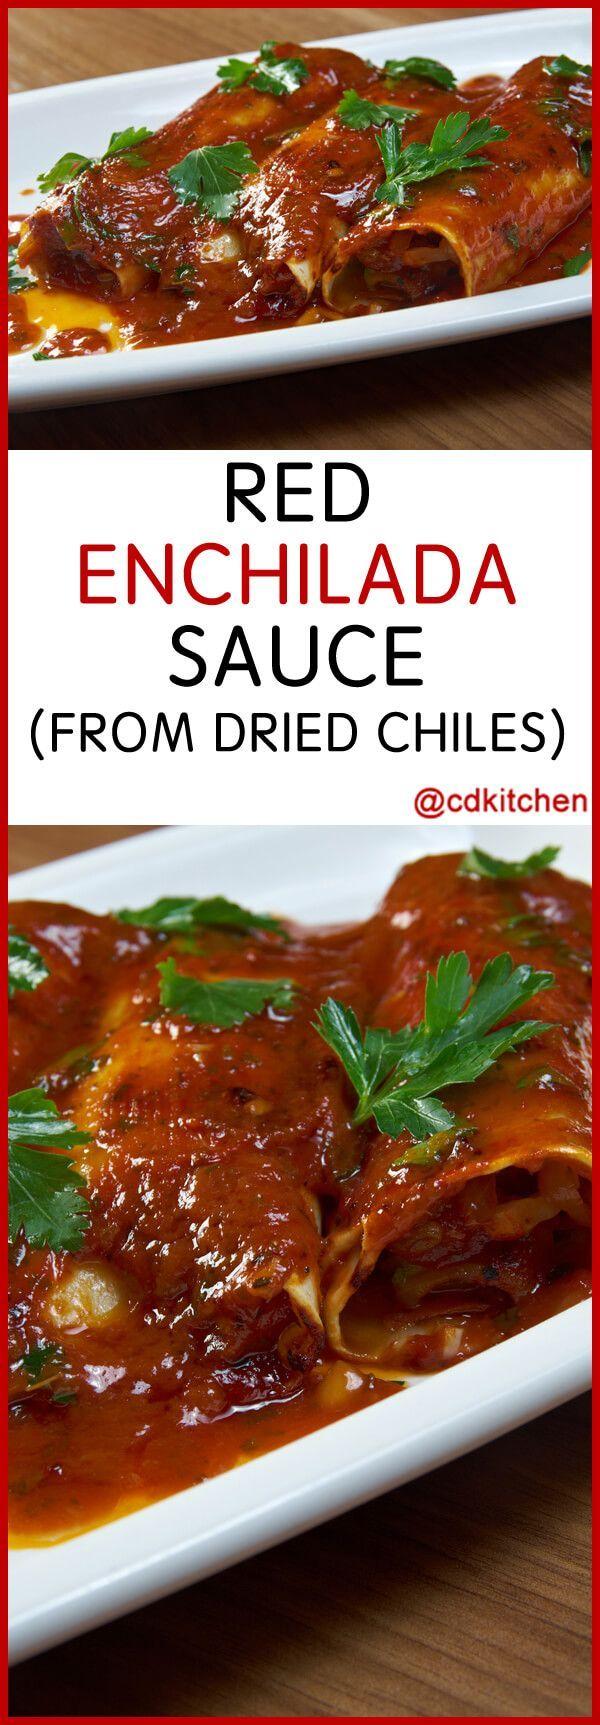 Red Enchilada Sauce From Dried Chiles - Recipe is made with garlic powder, cumin, dried oregano, salt, California chiles, water, lard or vegetable oil, garlic, all-purpose flour, vinegar | CDKitchen.com